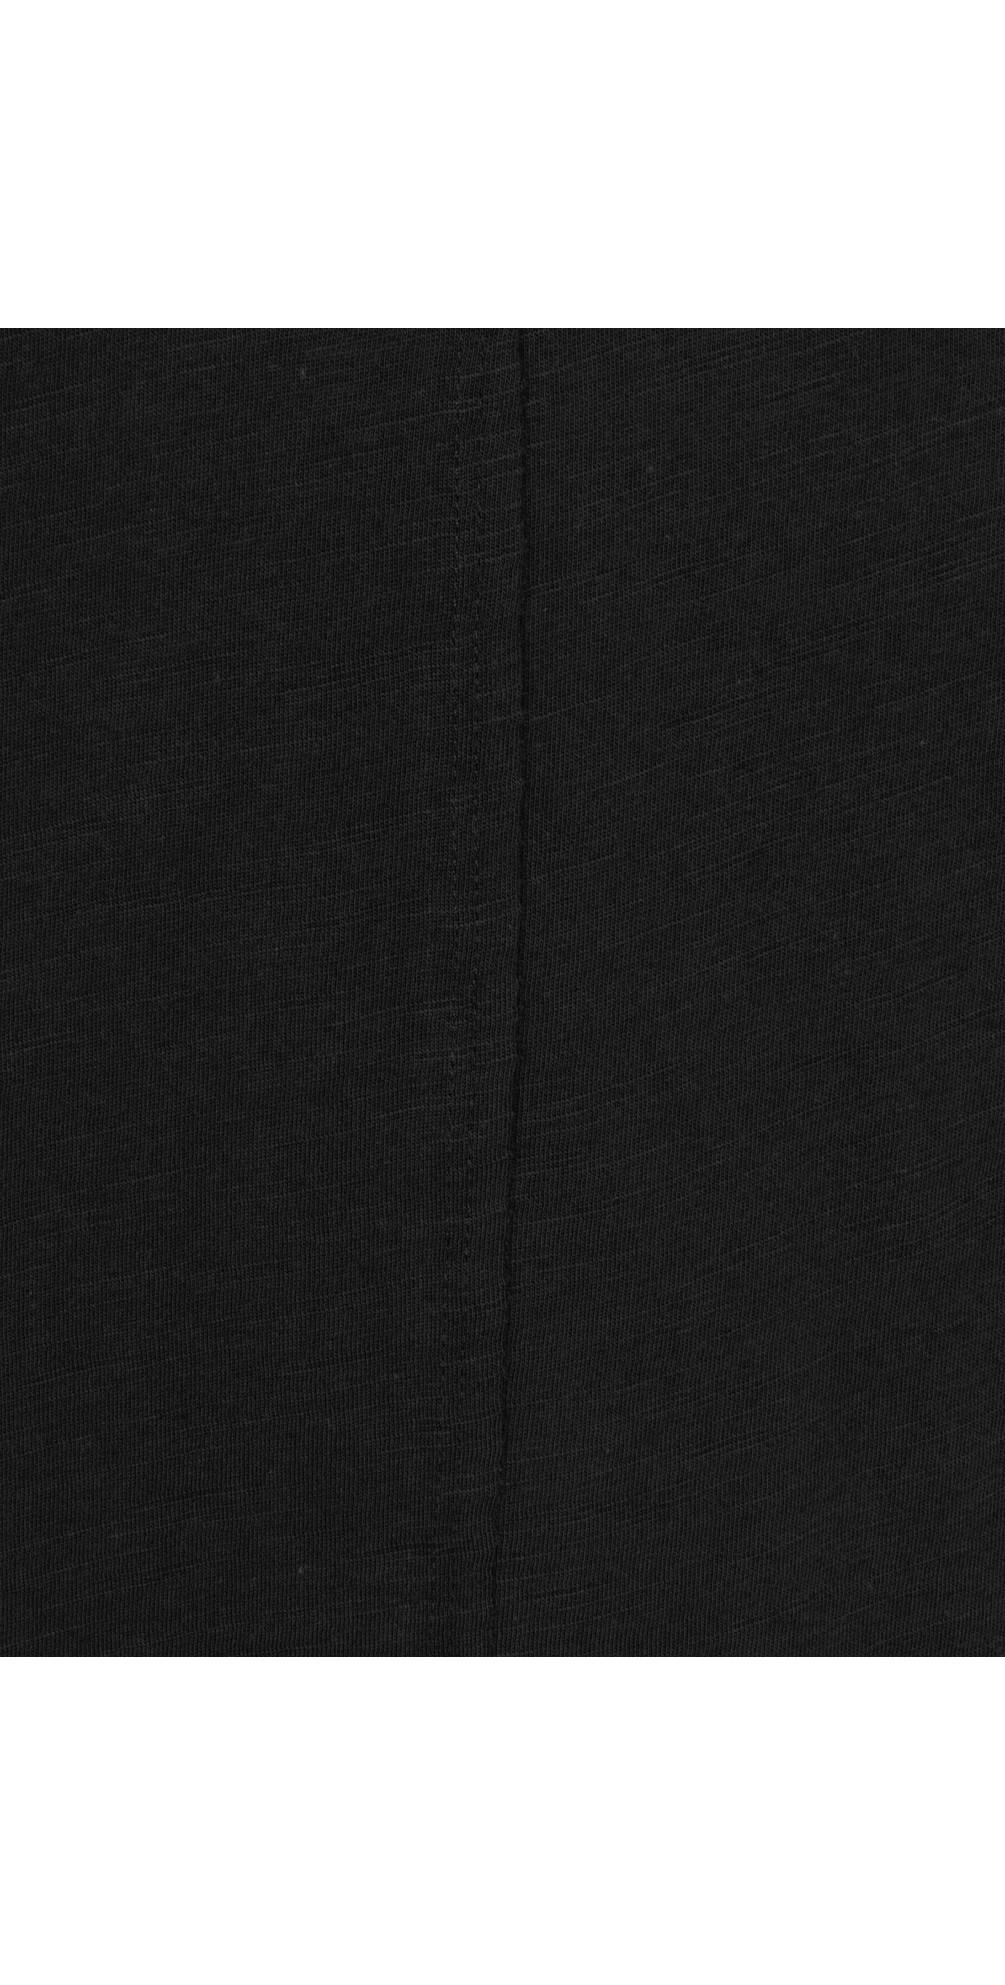 Cotton Slub Jersey Dress main image